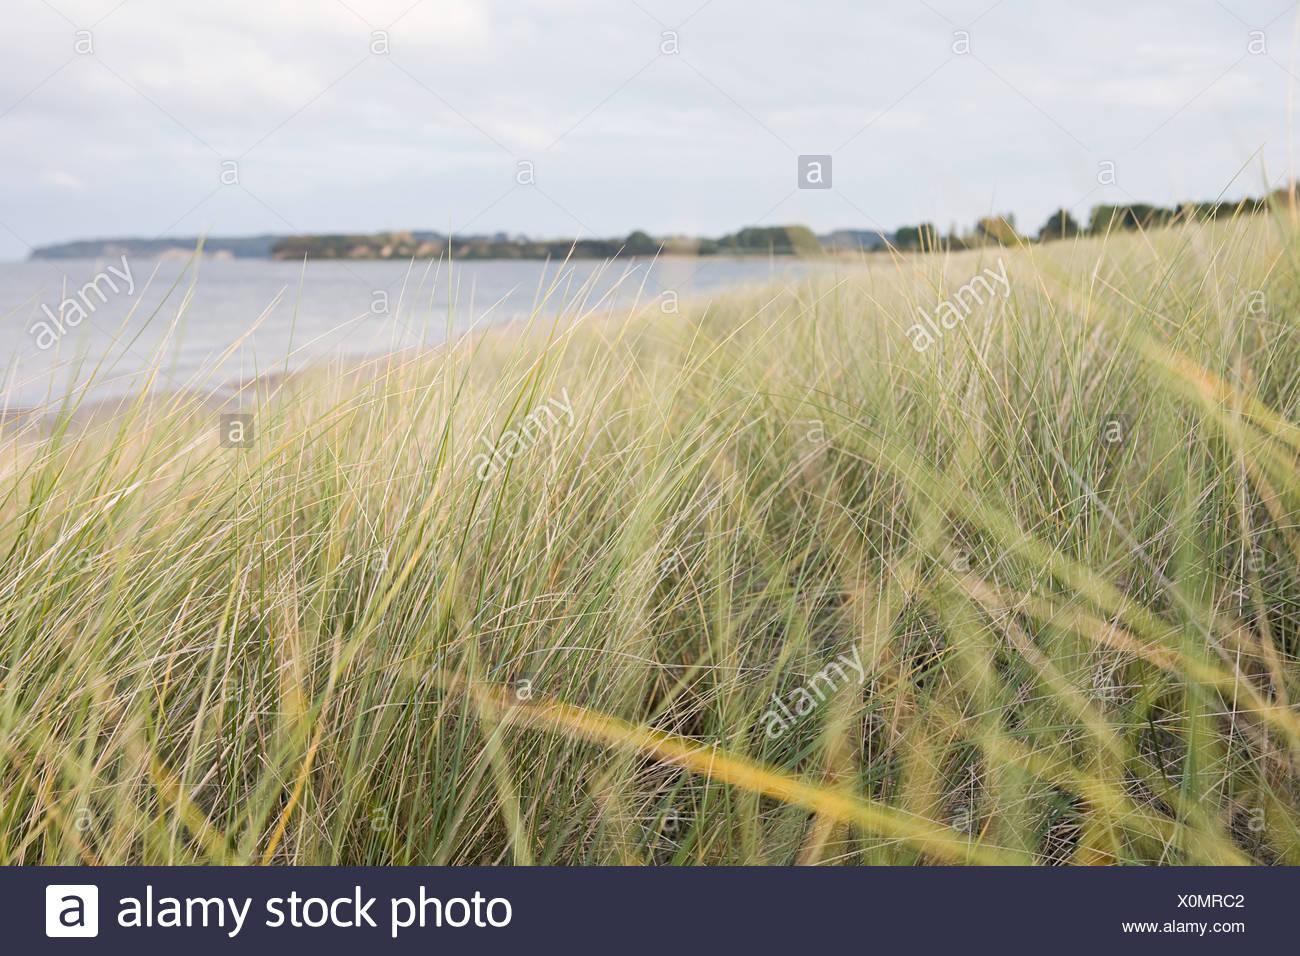 Marram grass near the sea - Stock Image